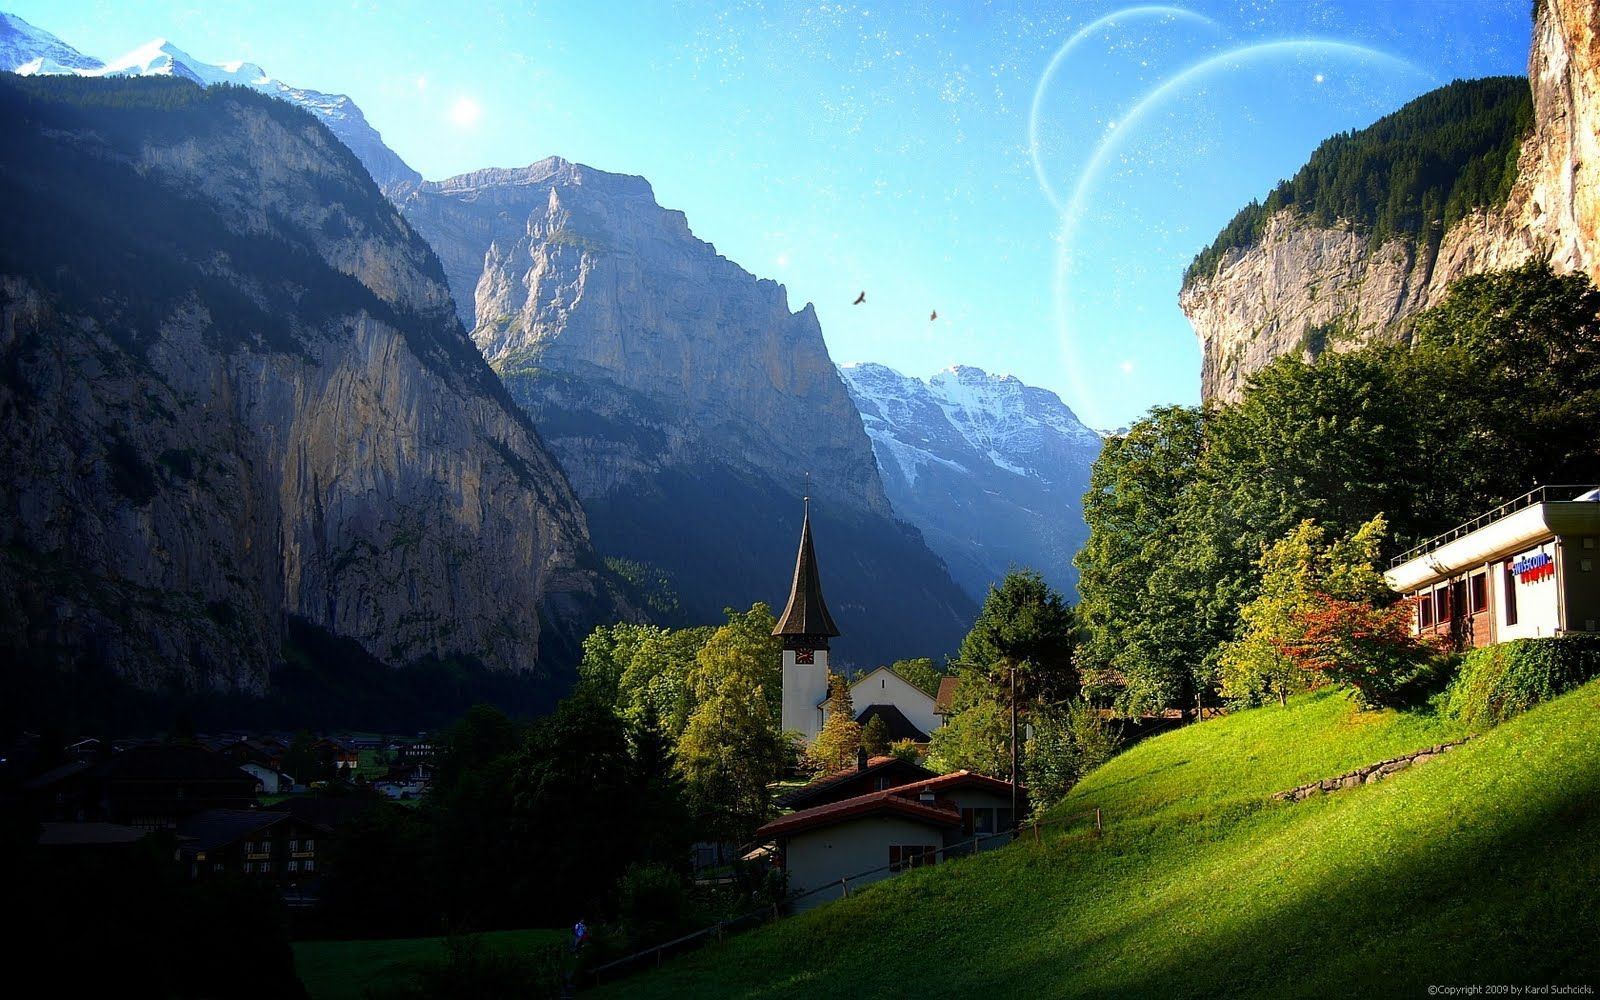 70 paisajes en hd para fondos de escritorio megapost for Imagenes para fondo de pantalla wallpapers